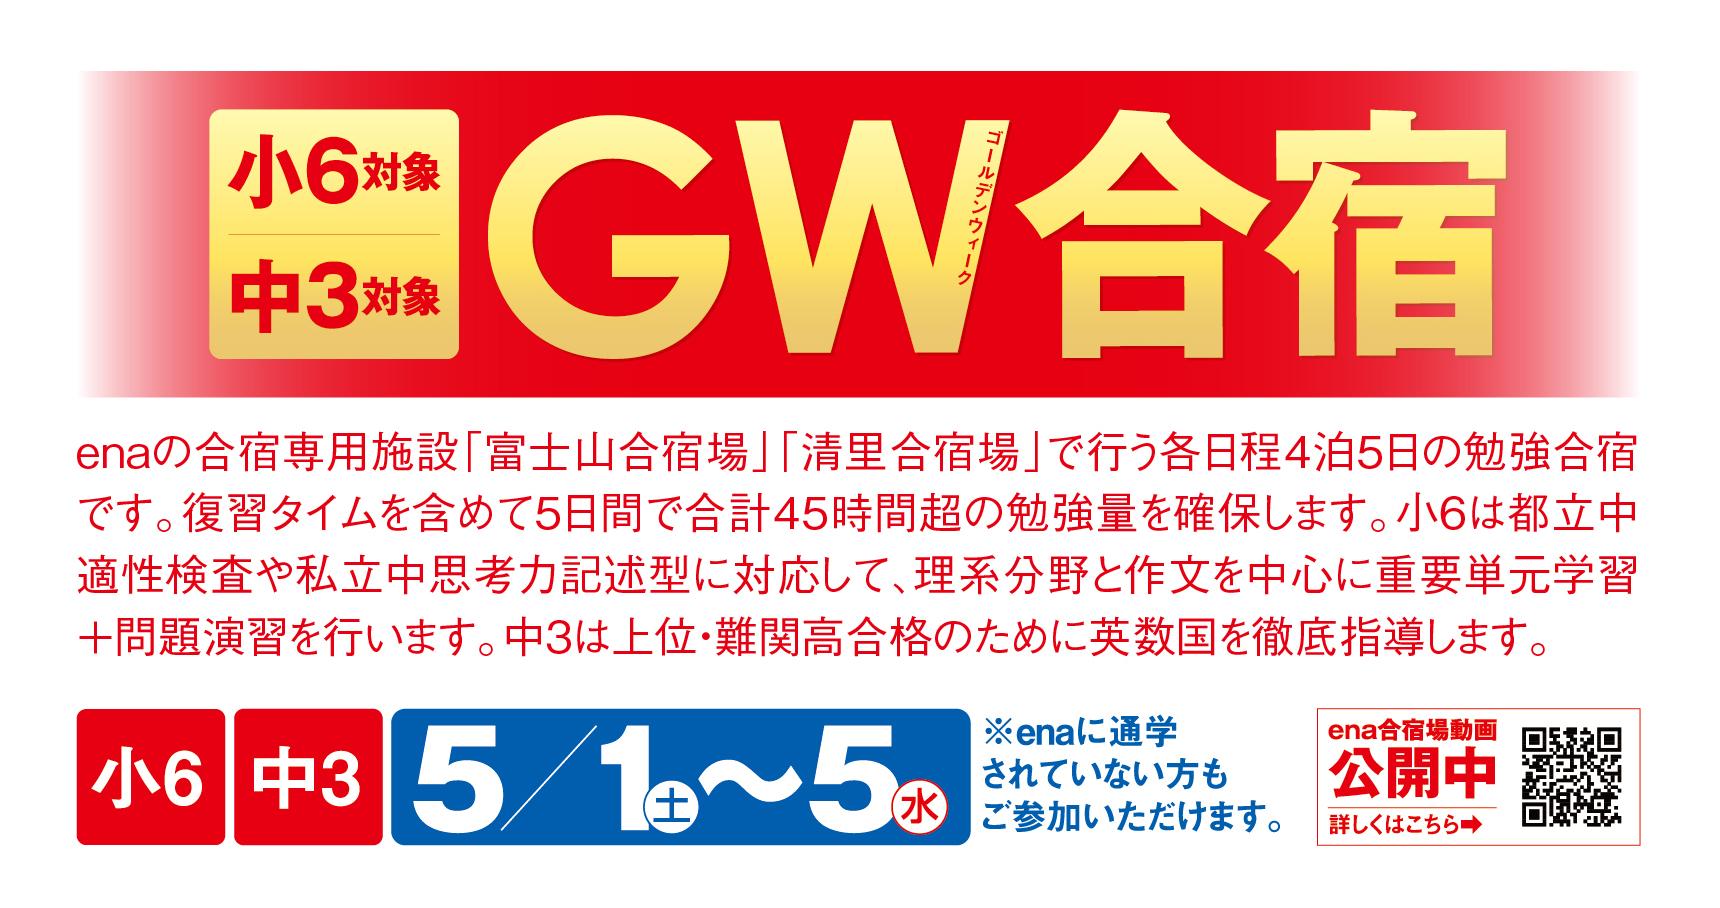 gw_gassyuku01